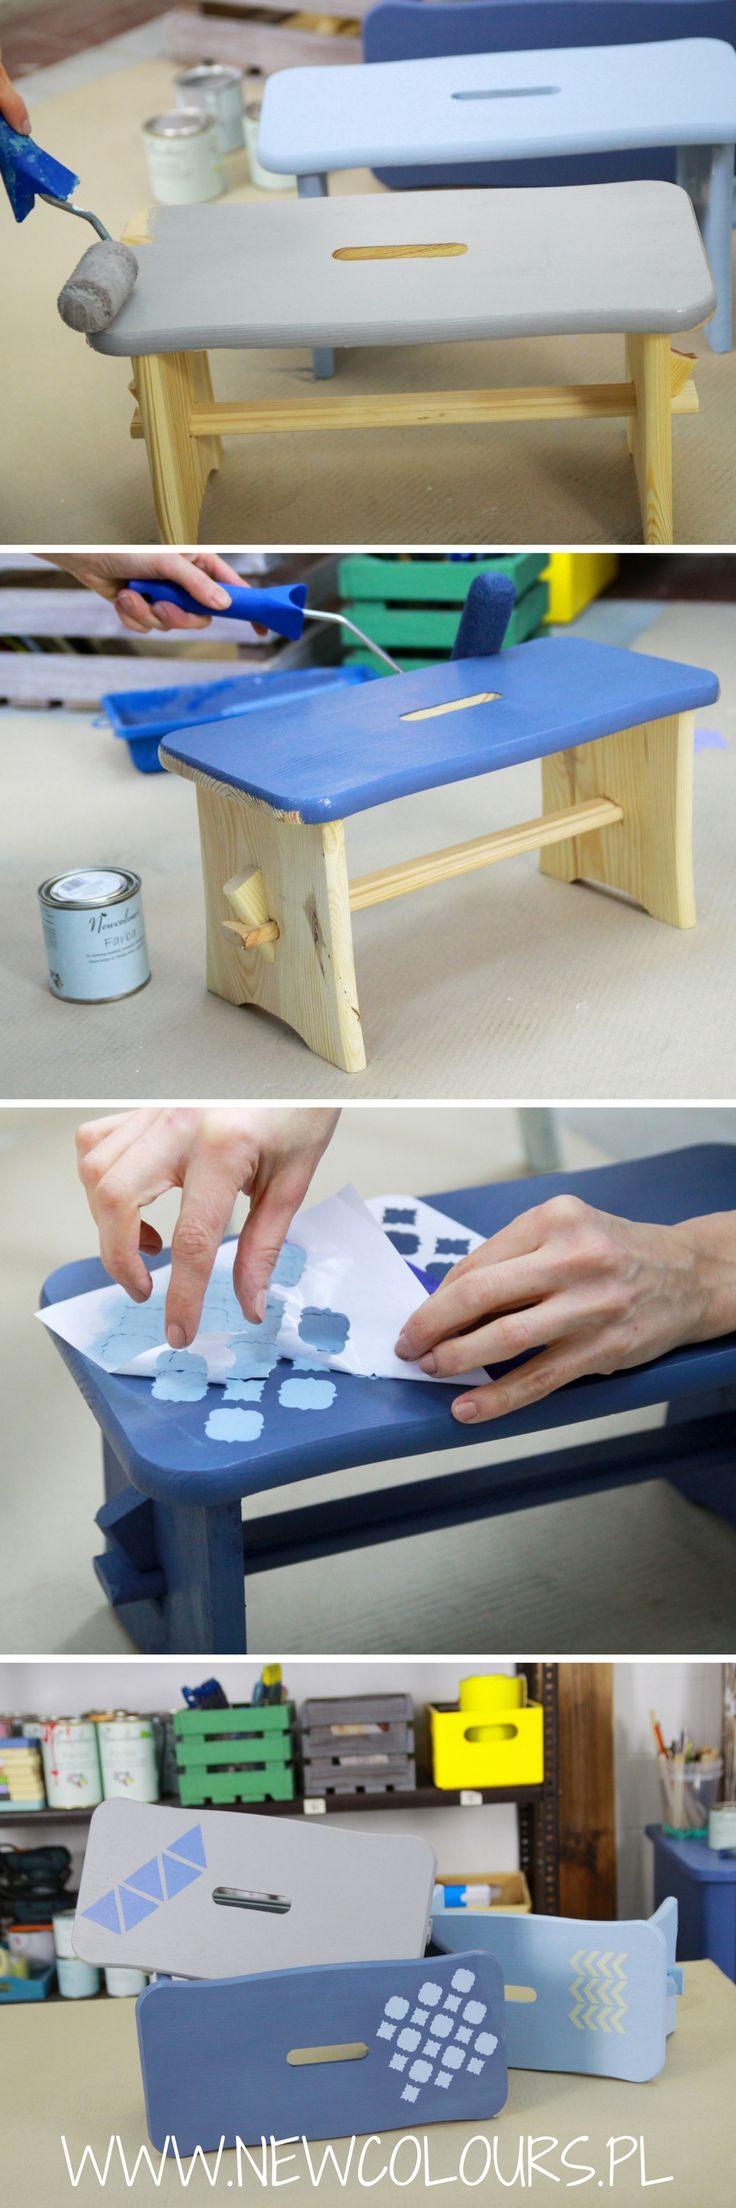 Sosnowe podnożki w nowych kolorach - Fabry DIY Newcolours. Blue and gray stools - Newcolours DIY Paints.